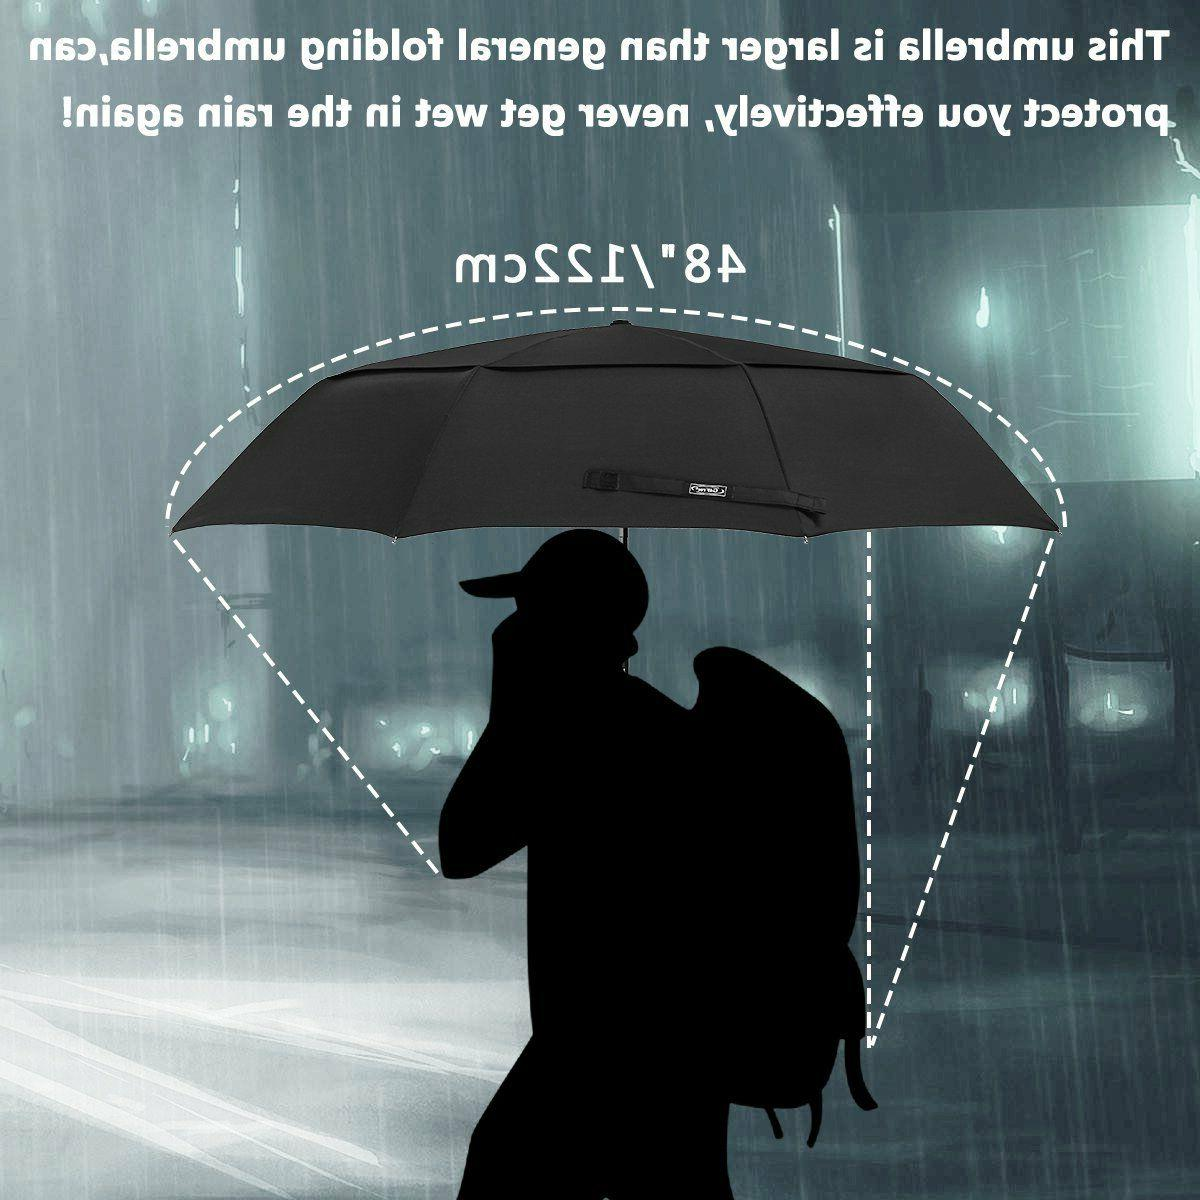 NEW In Large CompactFoldingGolfUmbrellaTravel Umbrella-